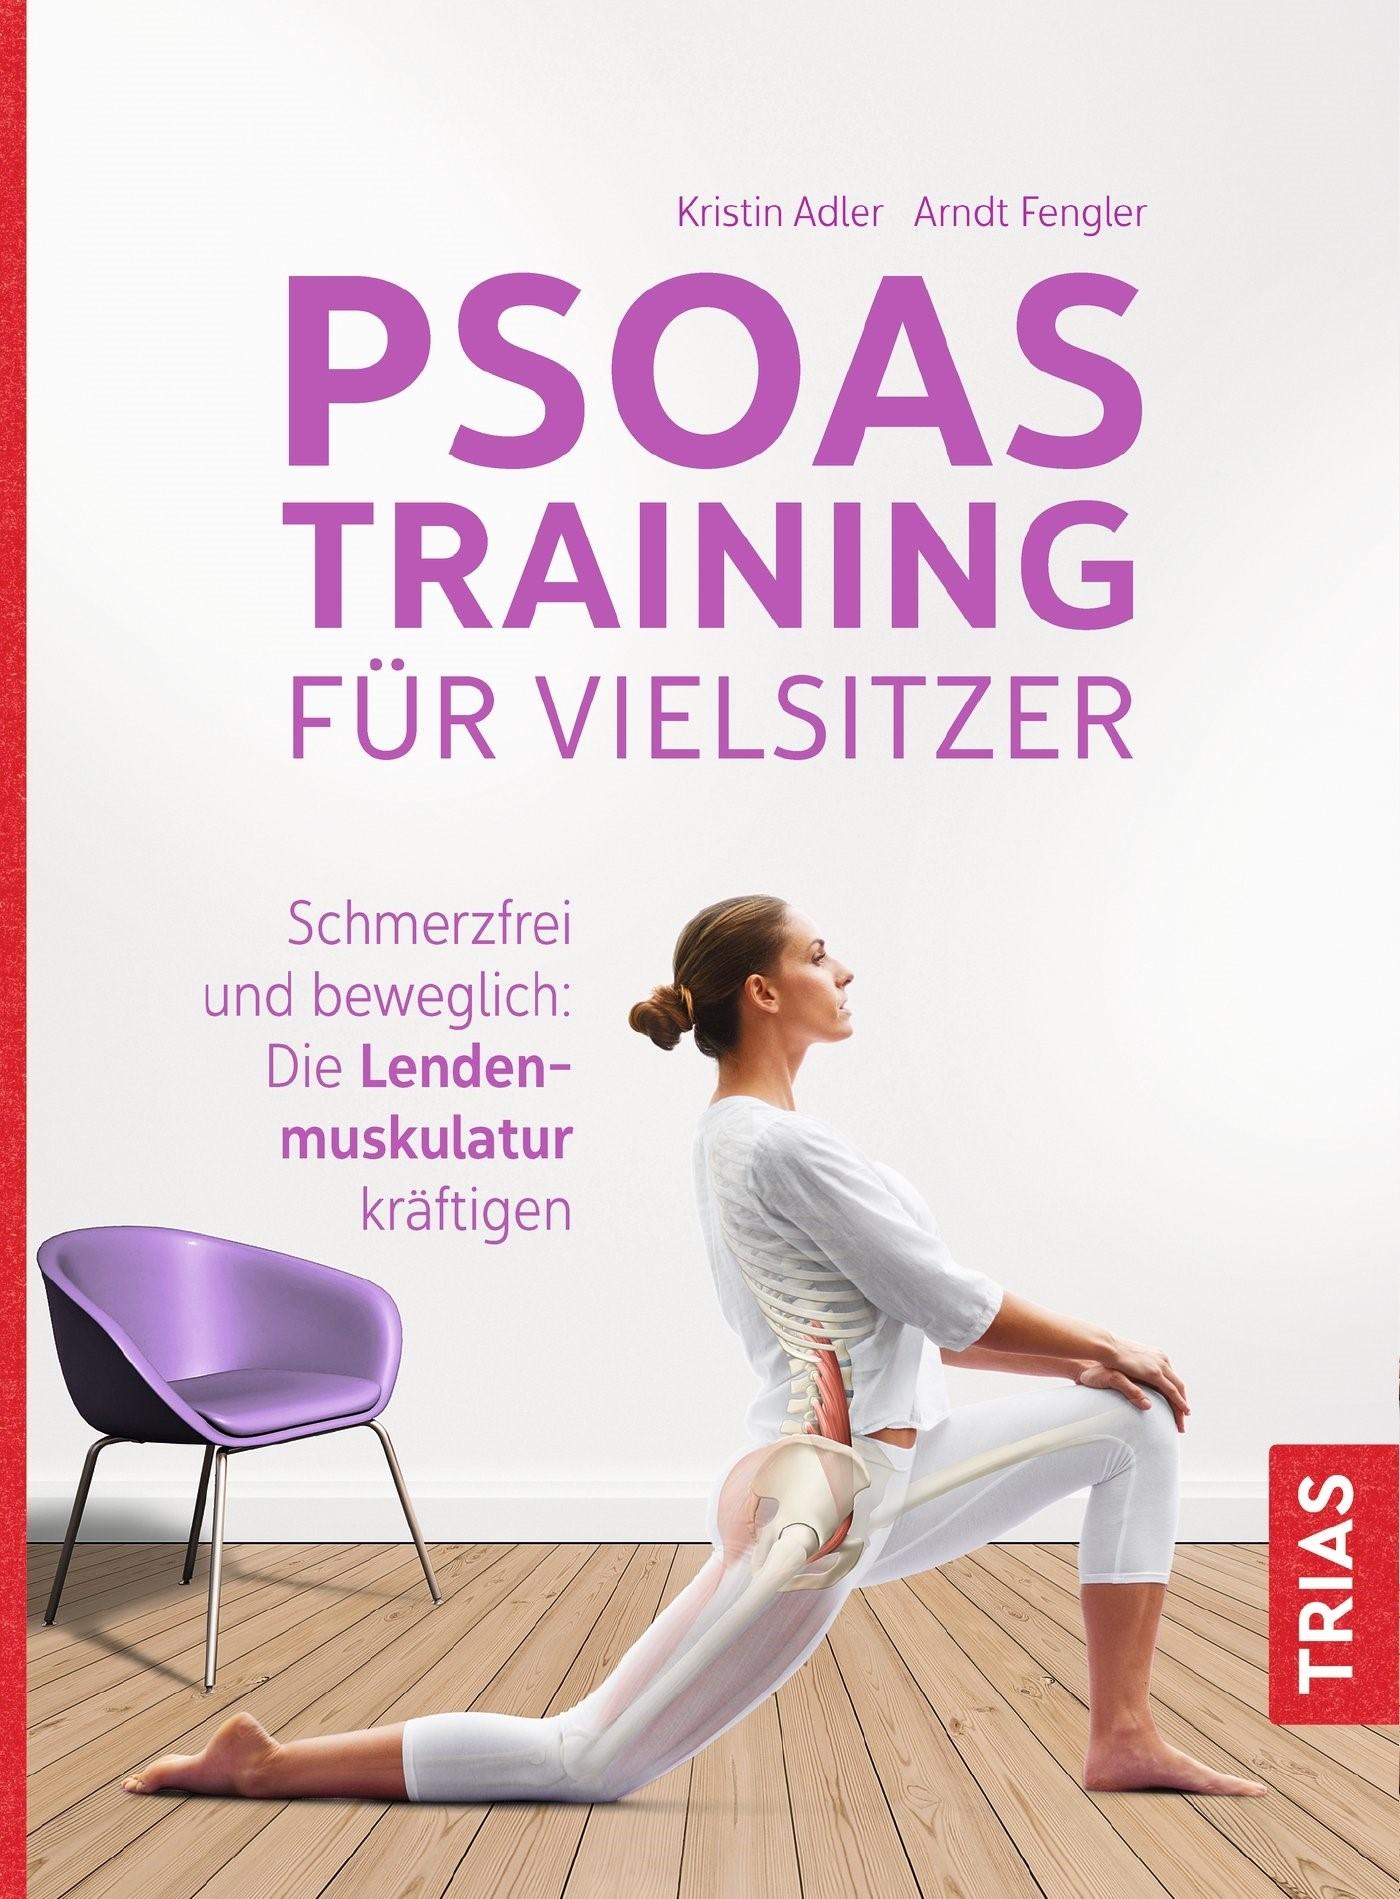 Psoas-Training für Vielsitzer | Adler / Fengler, 2018 | Buch (Cover)